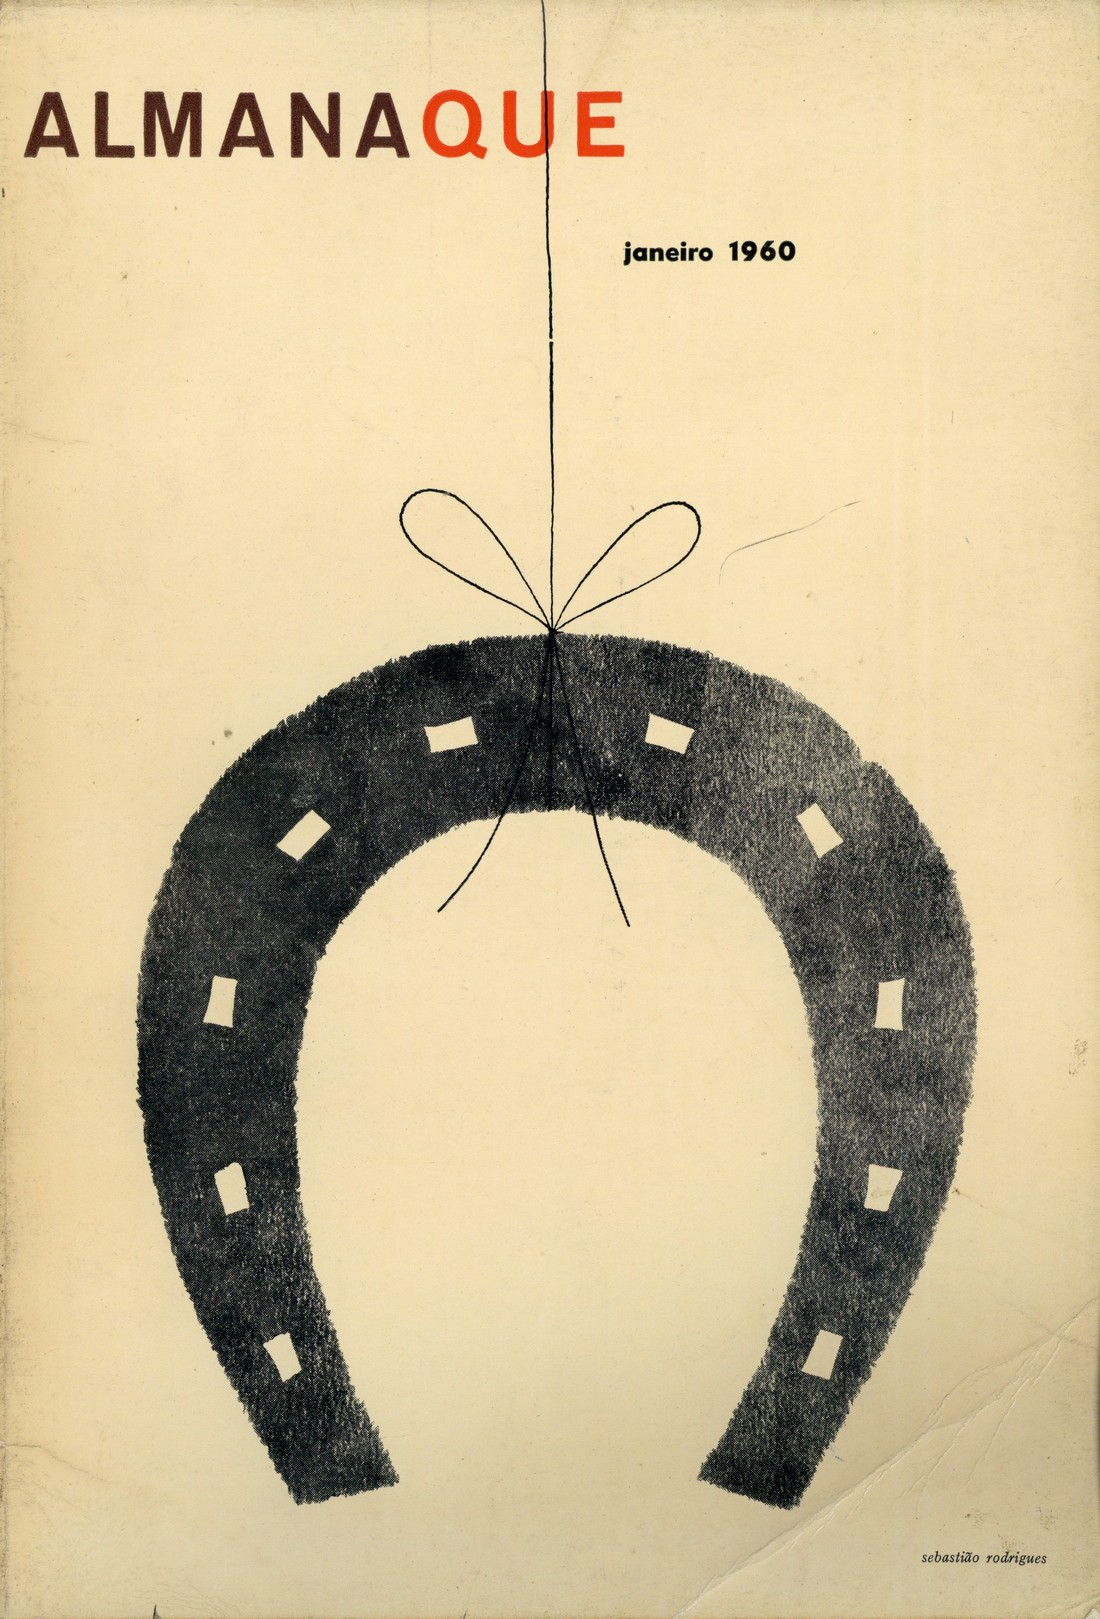 naran-ho-design-sebastiao-rodrigues